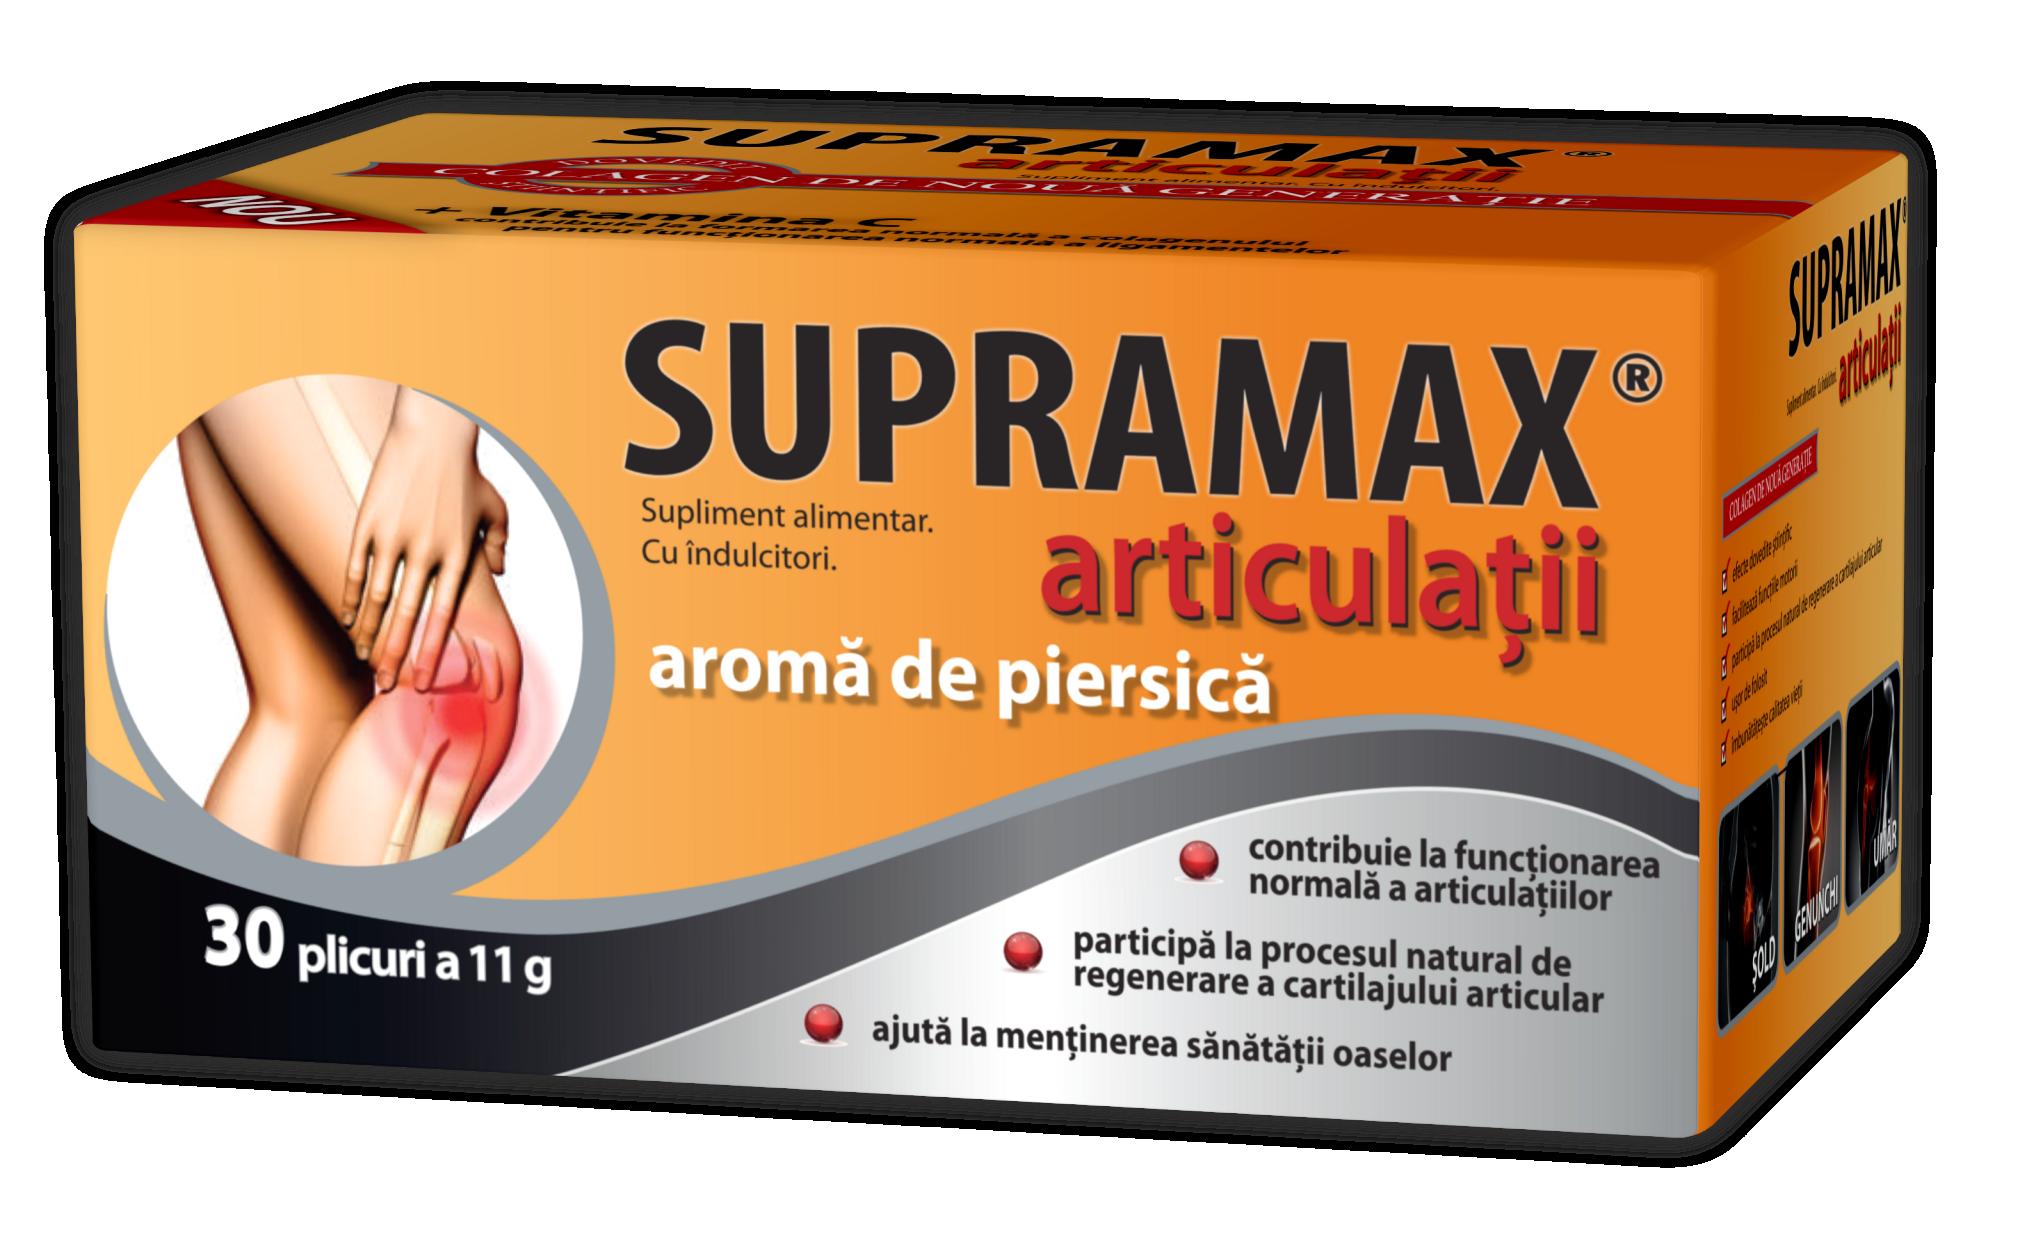 Tratează homeopatia cu artroza tratamentul ligamentitei genunchiului